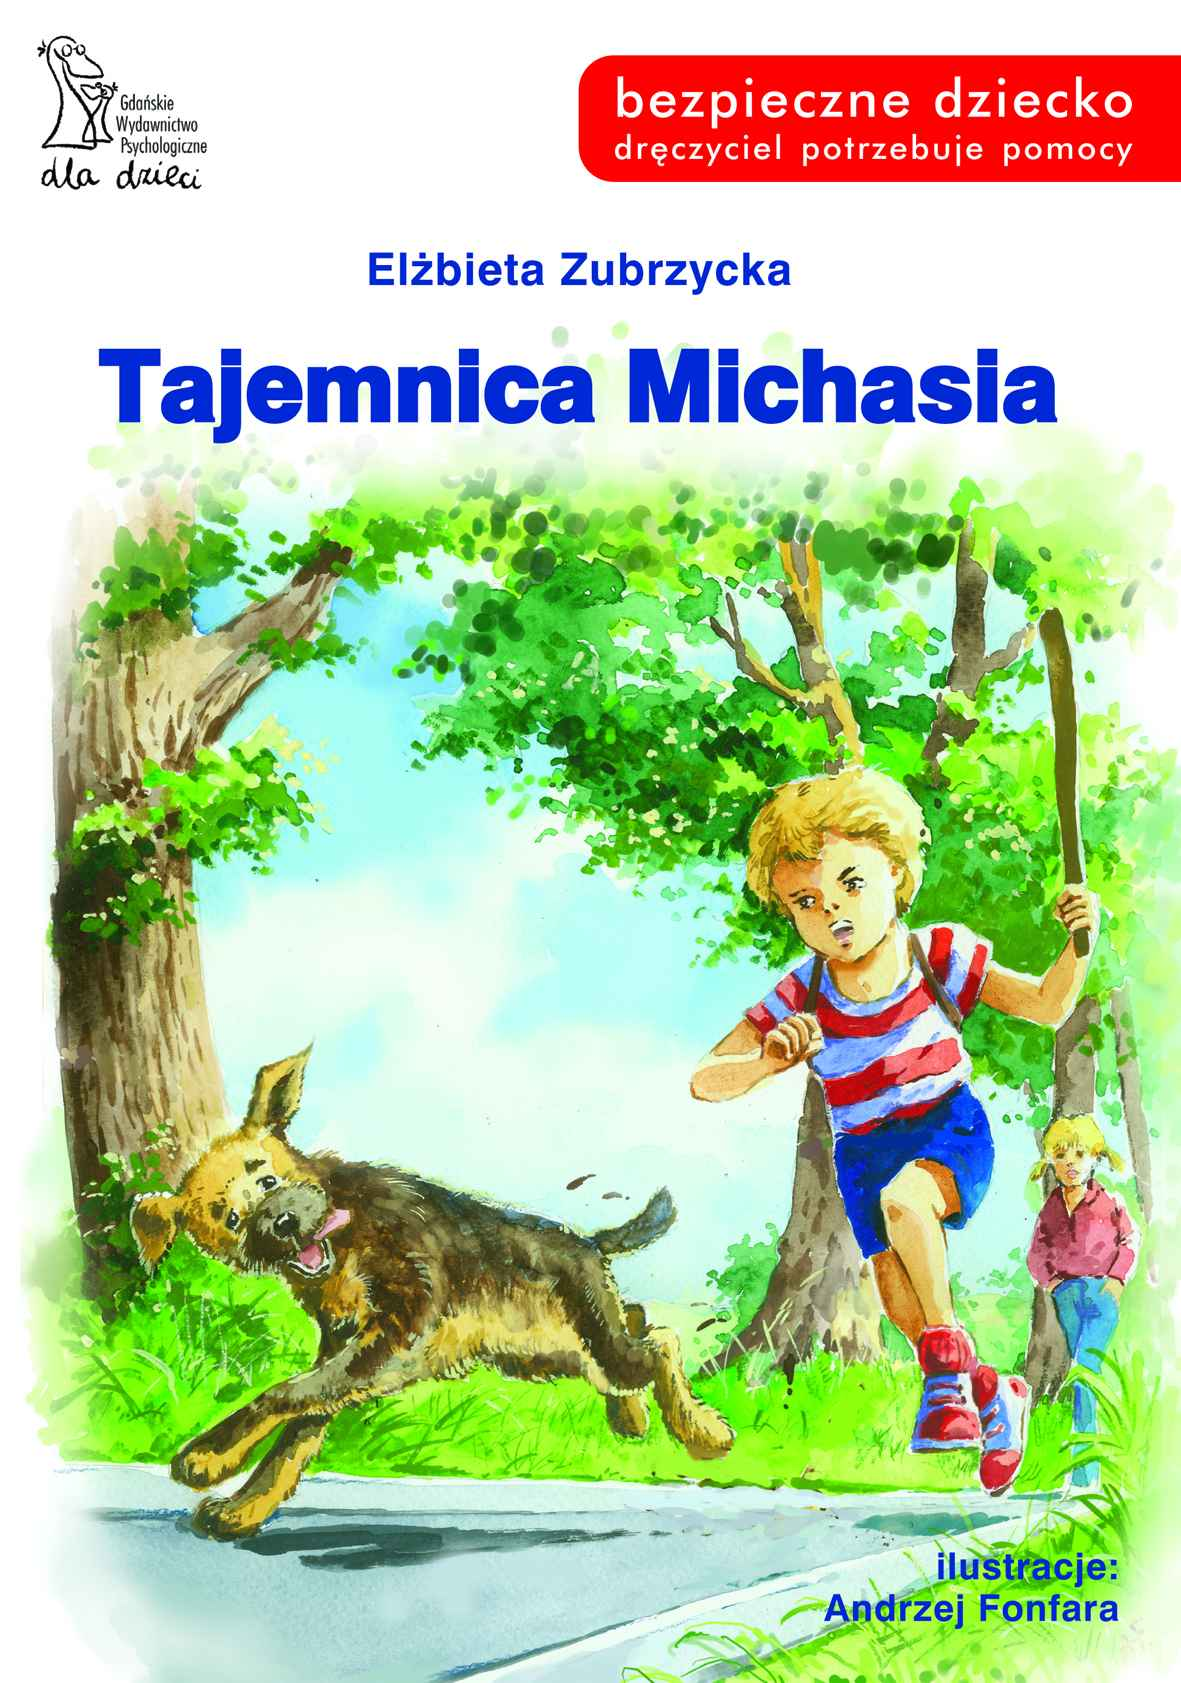 Tajemnica Michasia - Ebook (Książka na Kindle) do pobrania w formacie MOBI